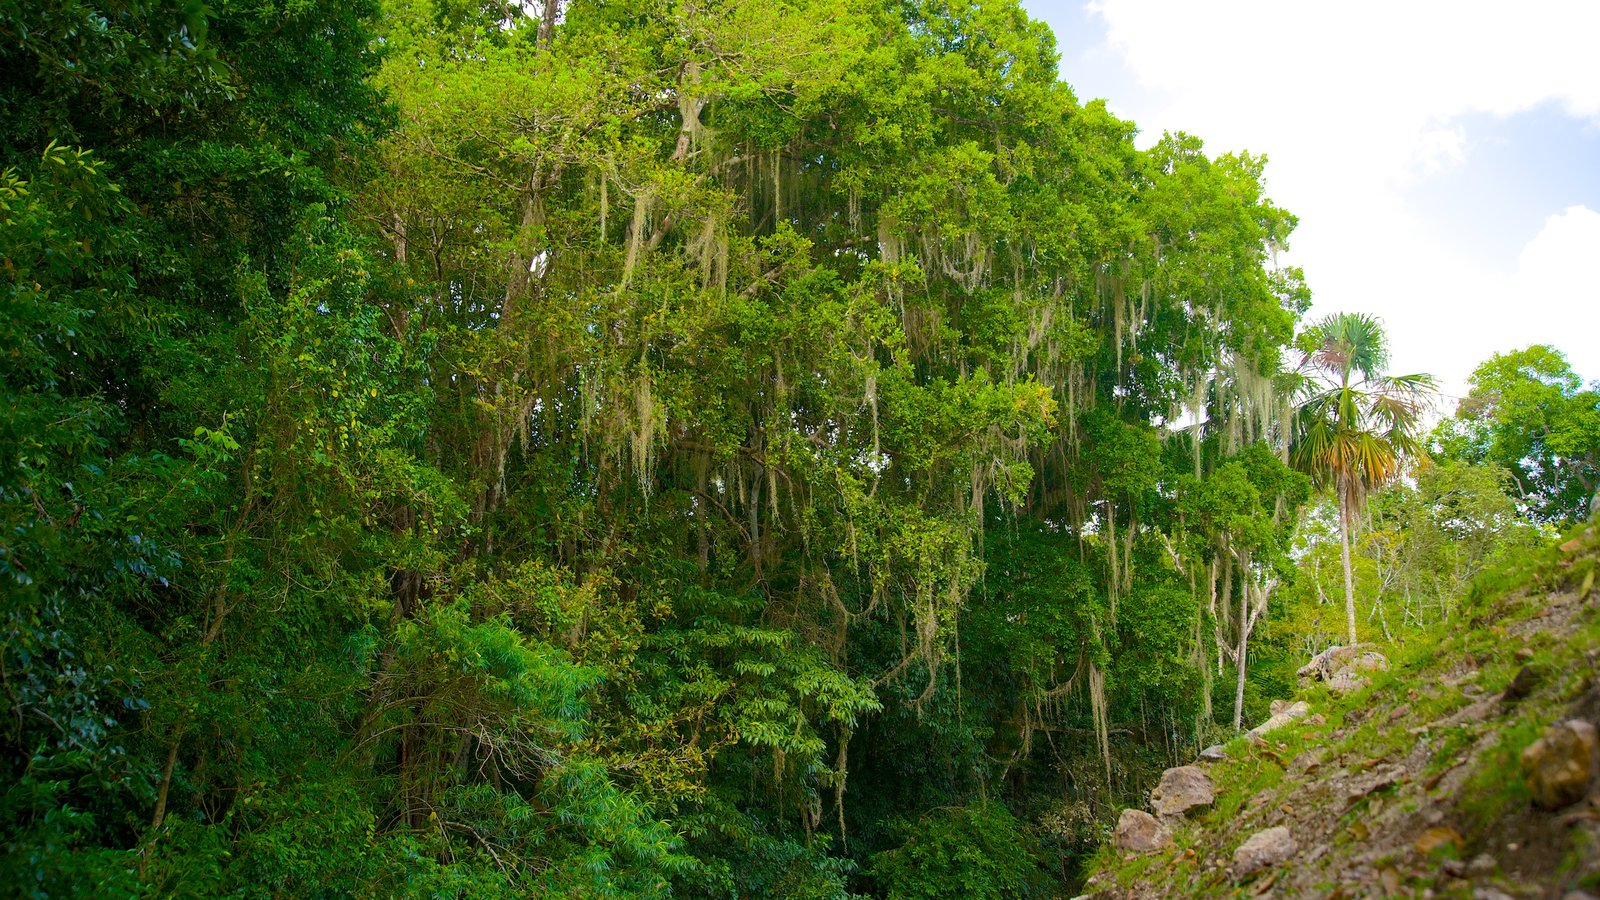 Lamanai featuring rainforest